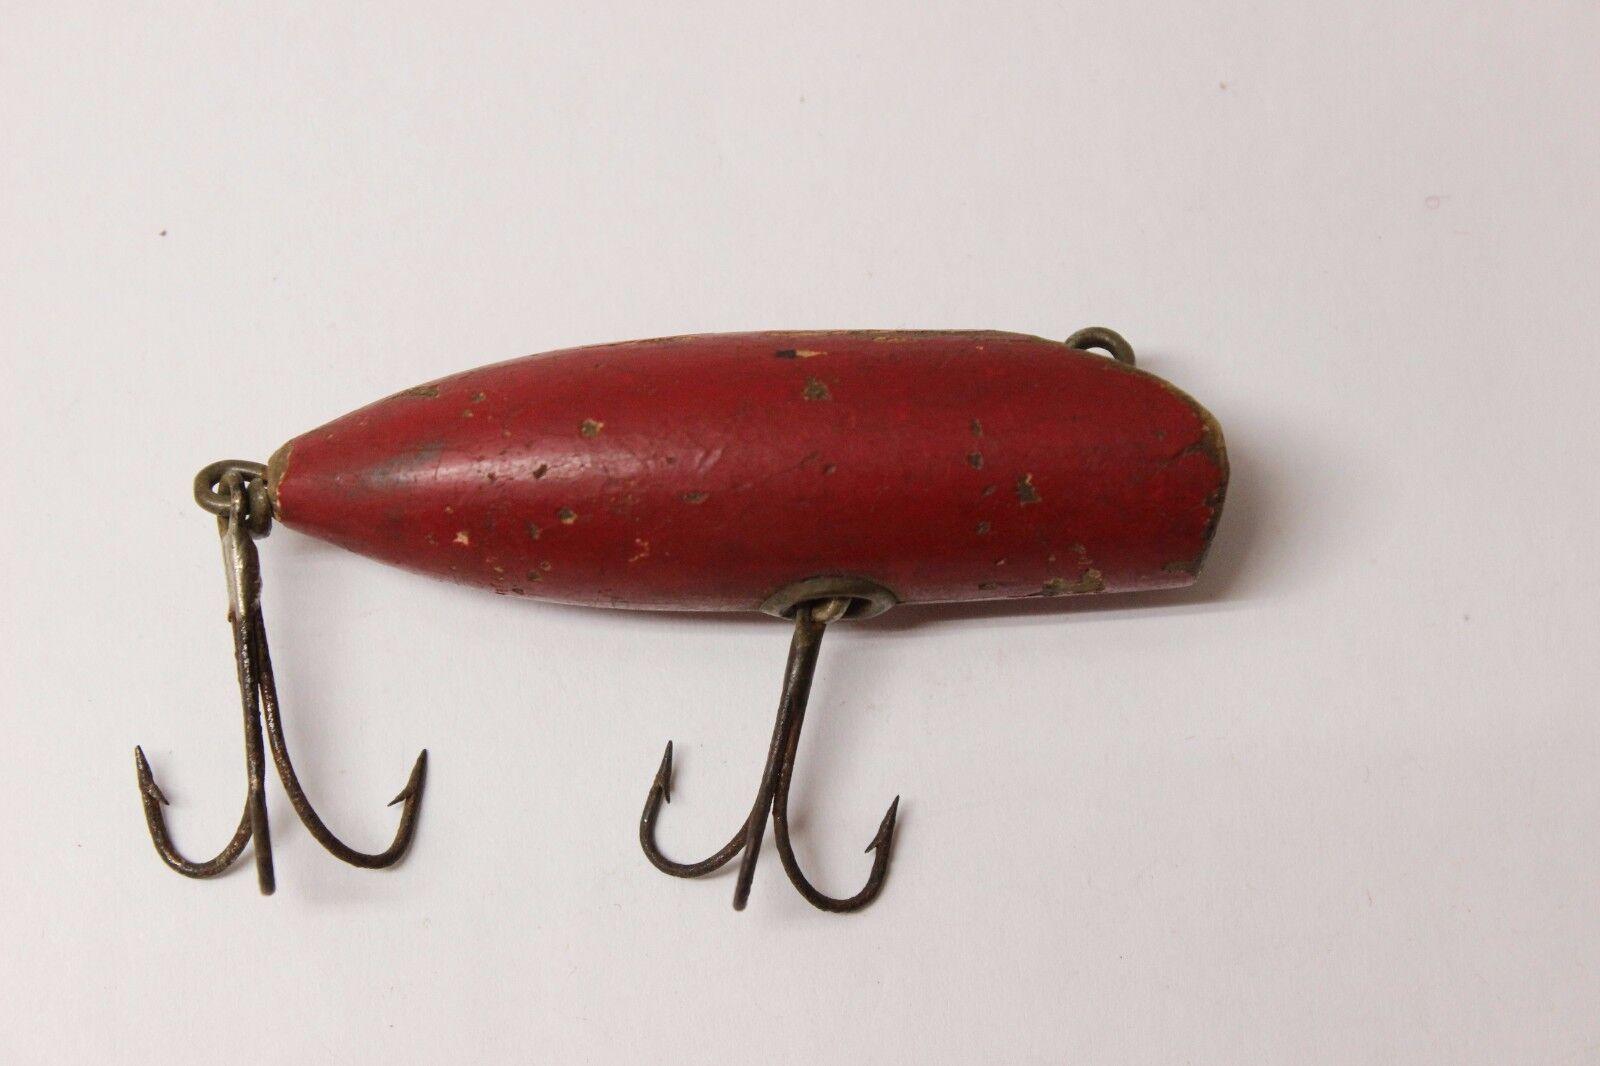 South Bend Antique 2 3 4  Red Bass-O-Reno Circa 1915-1920 Fishing Lure